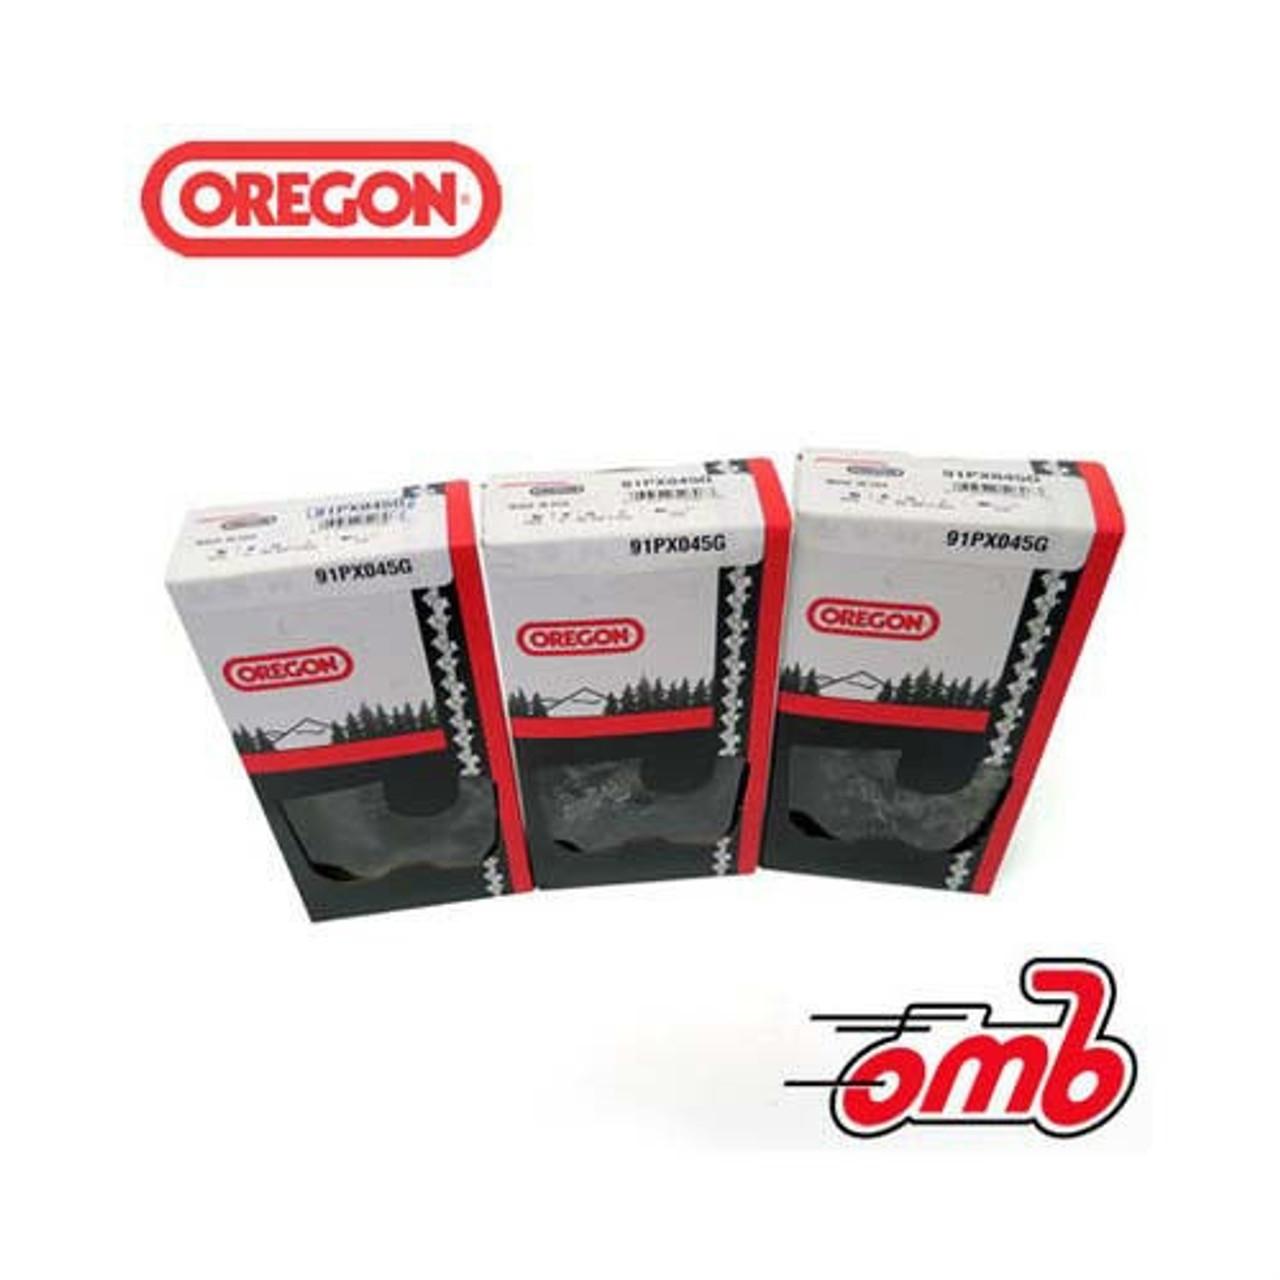 "(3) Loops 12"" Bar Oregon Chain 91PX045G .050 Gauge 3/8"" Pitch Low Kickback"